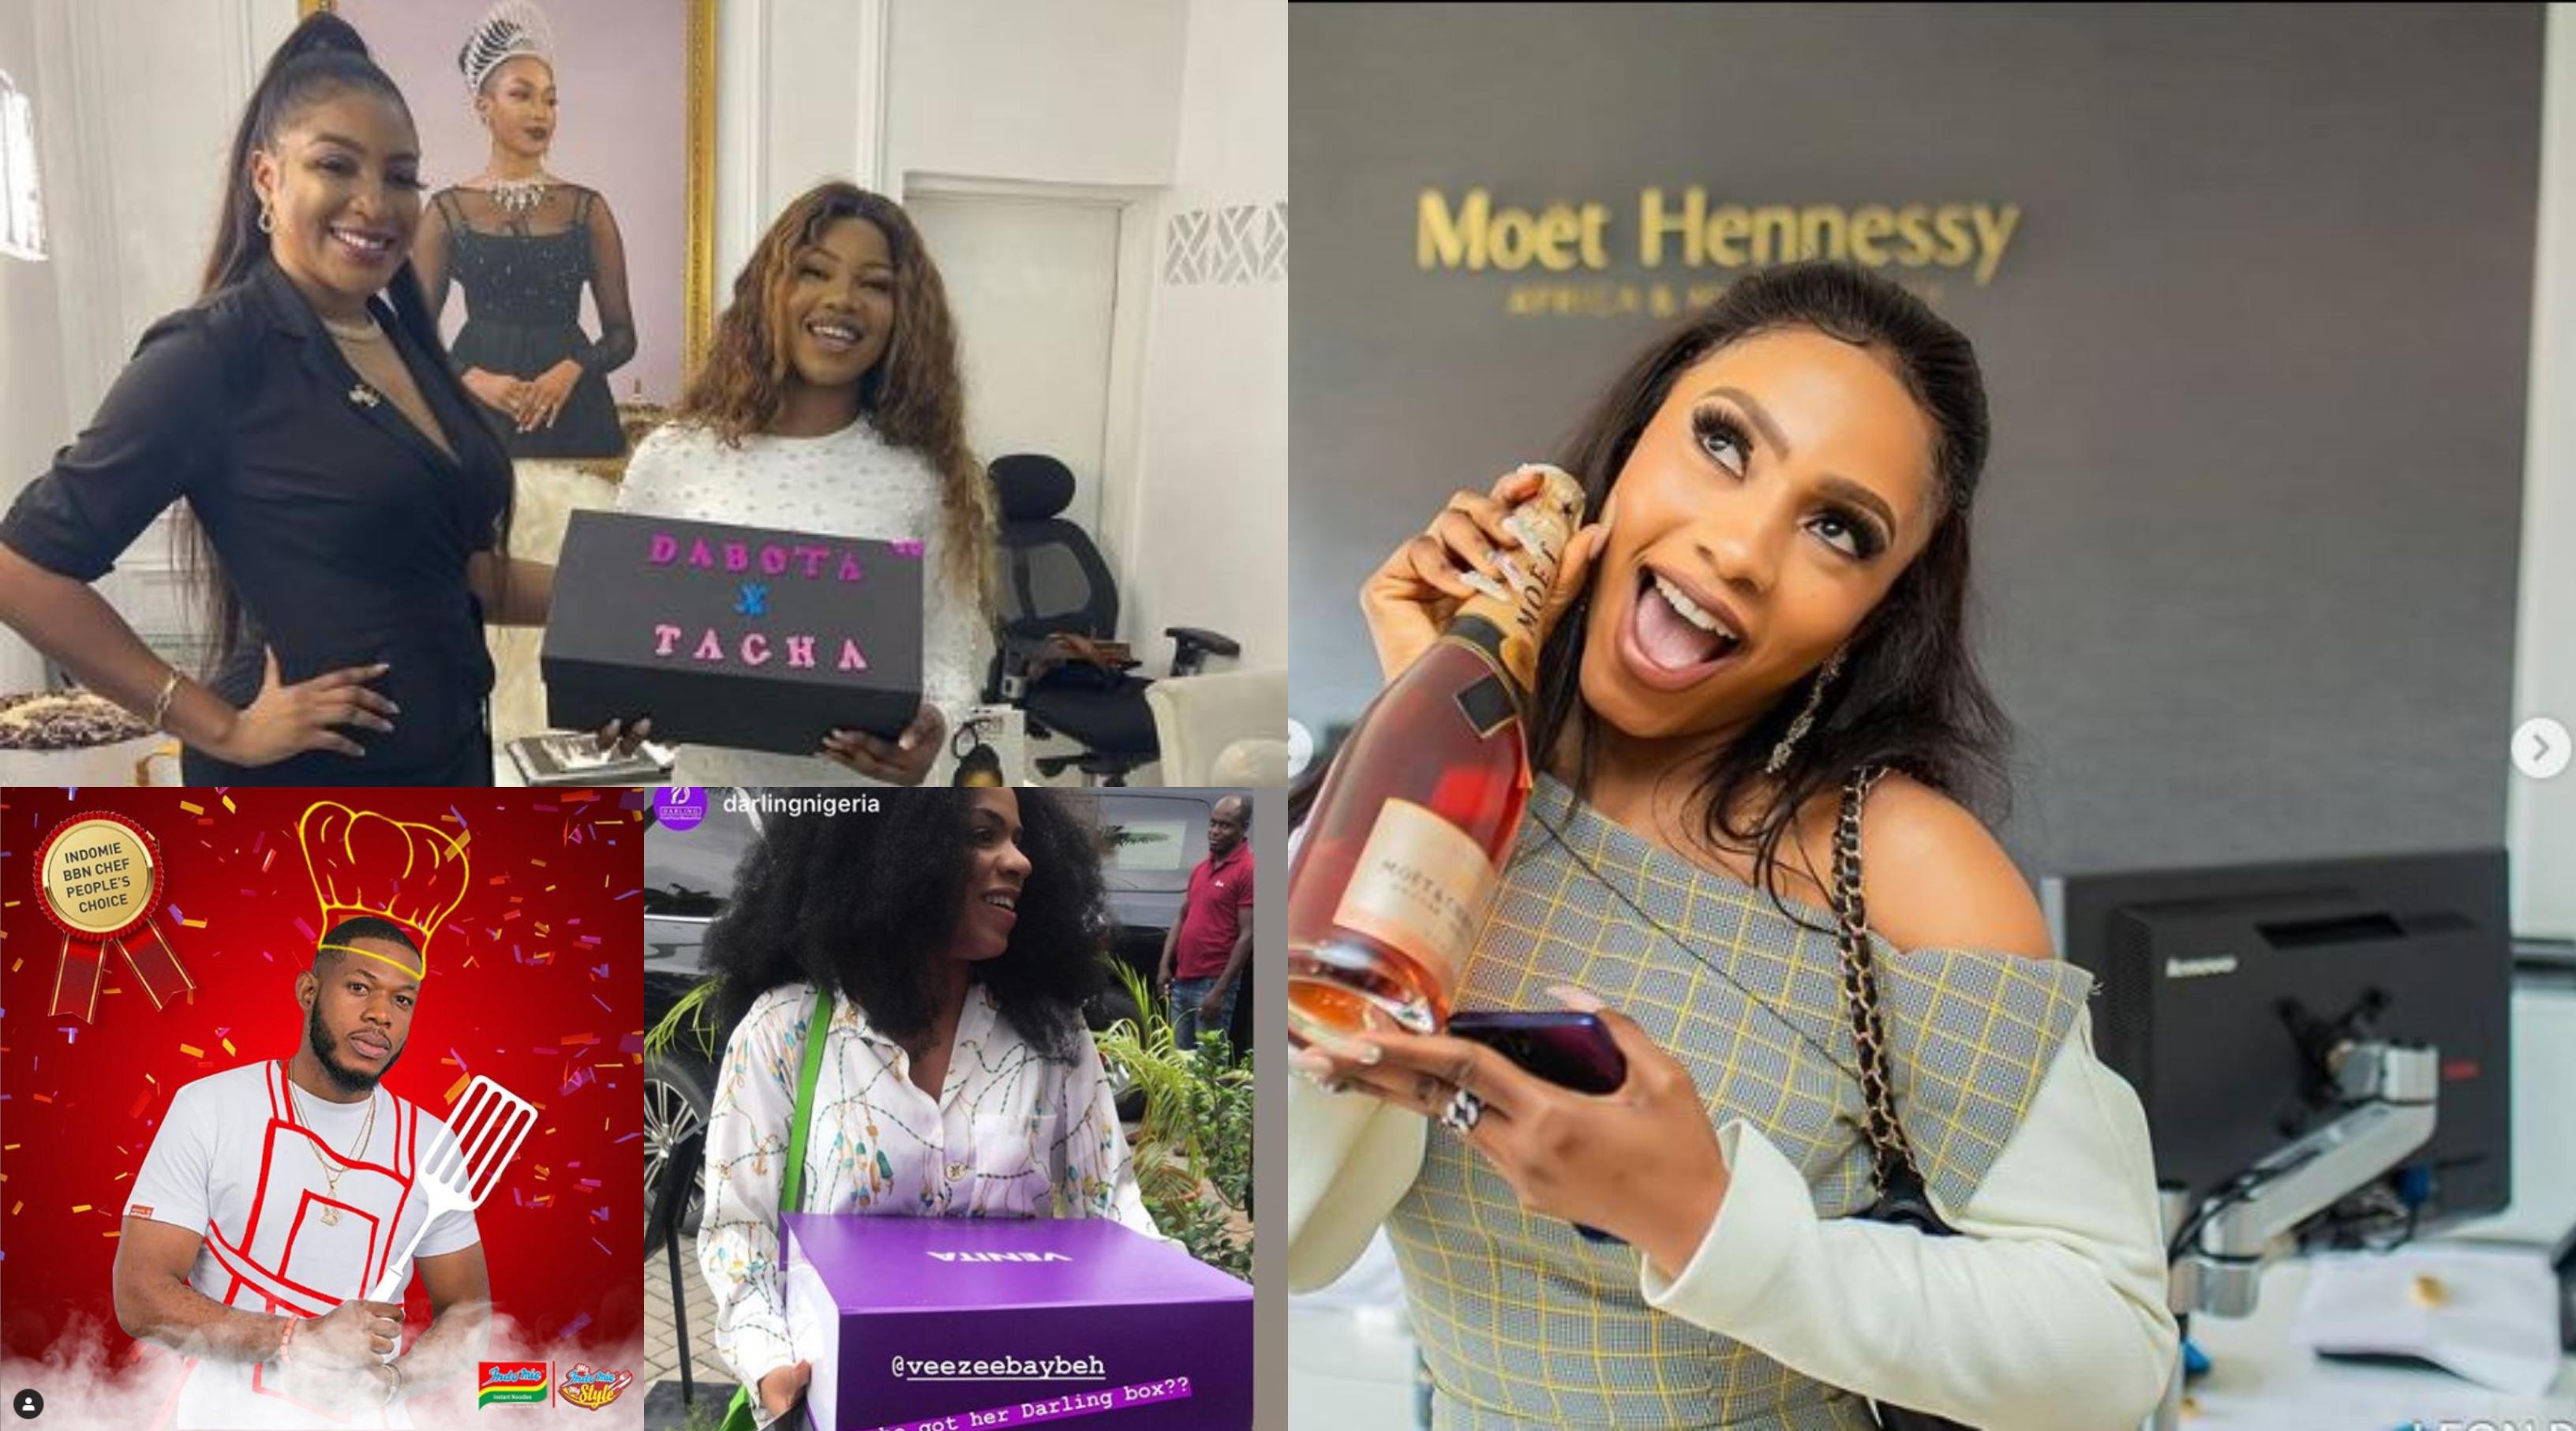 BBNaija 2019 housemates that have landed ambassadorial deals - Mercy and Venita got the juiciest of them all (Pics)